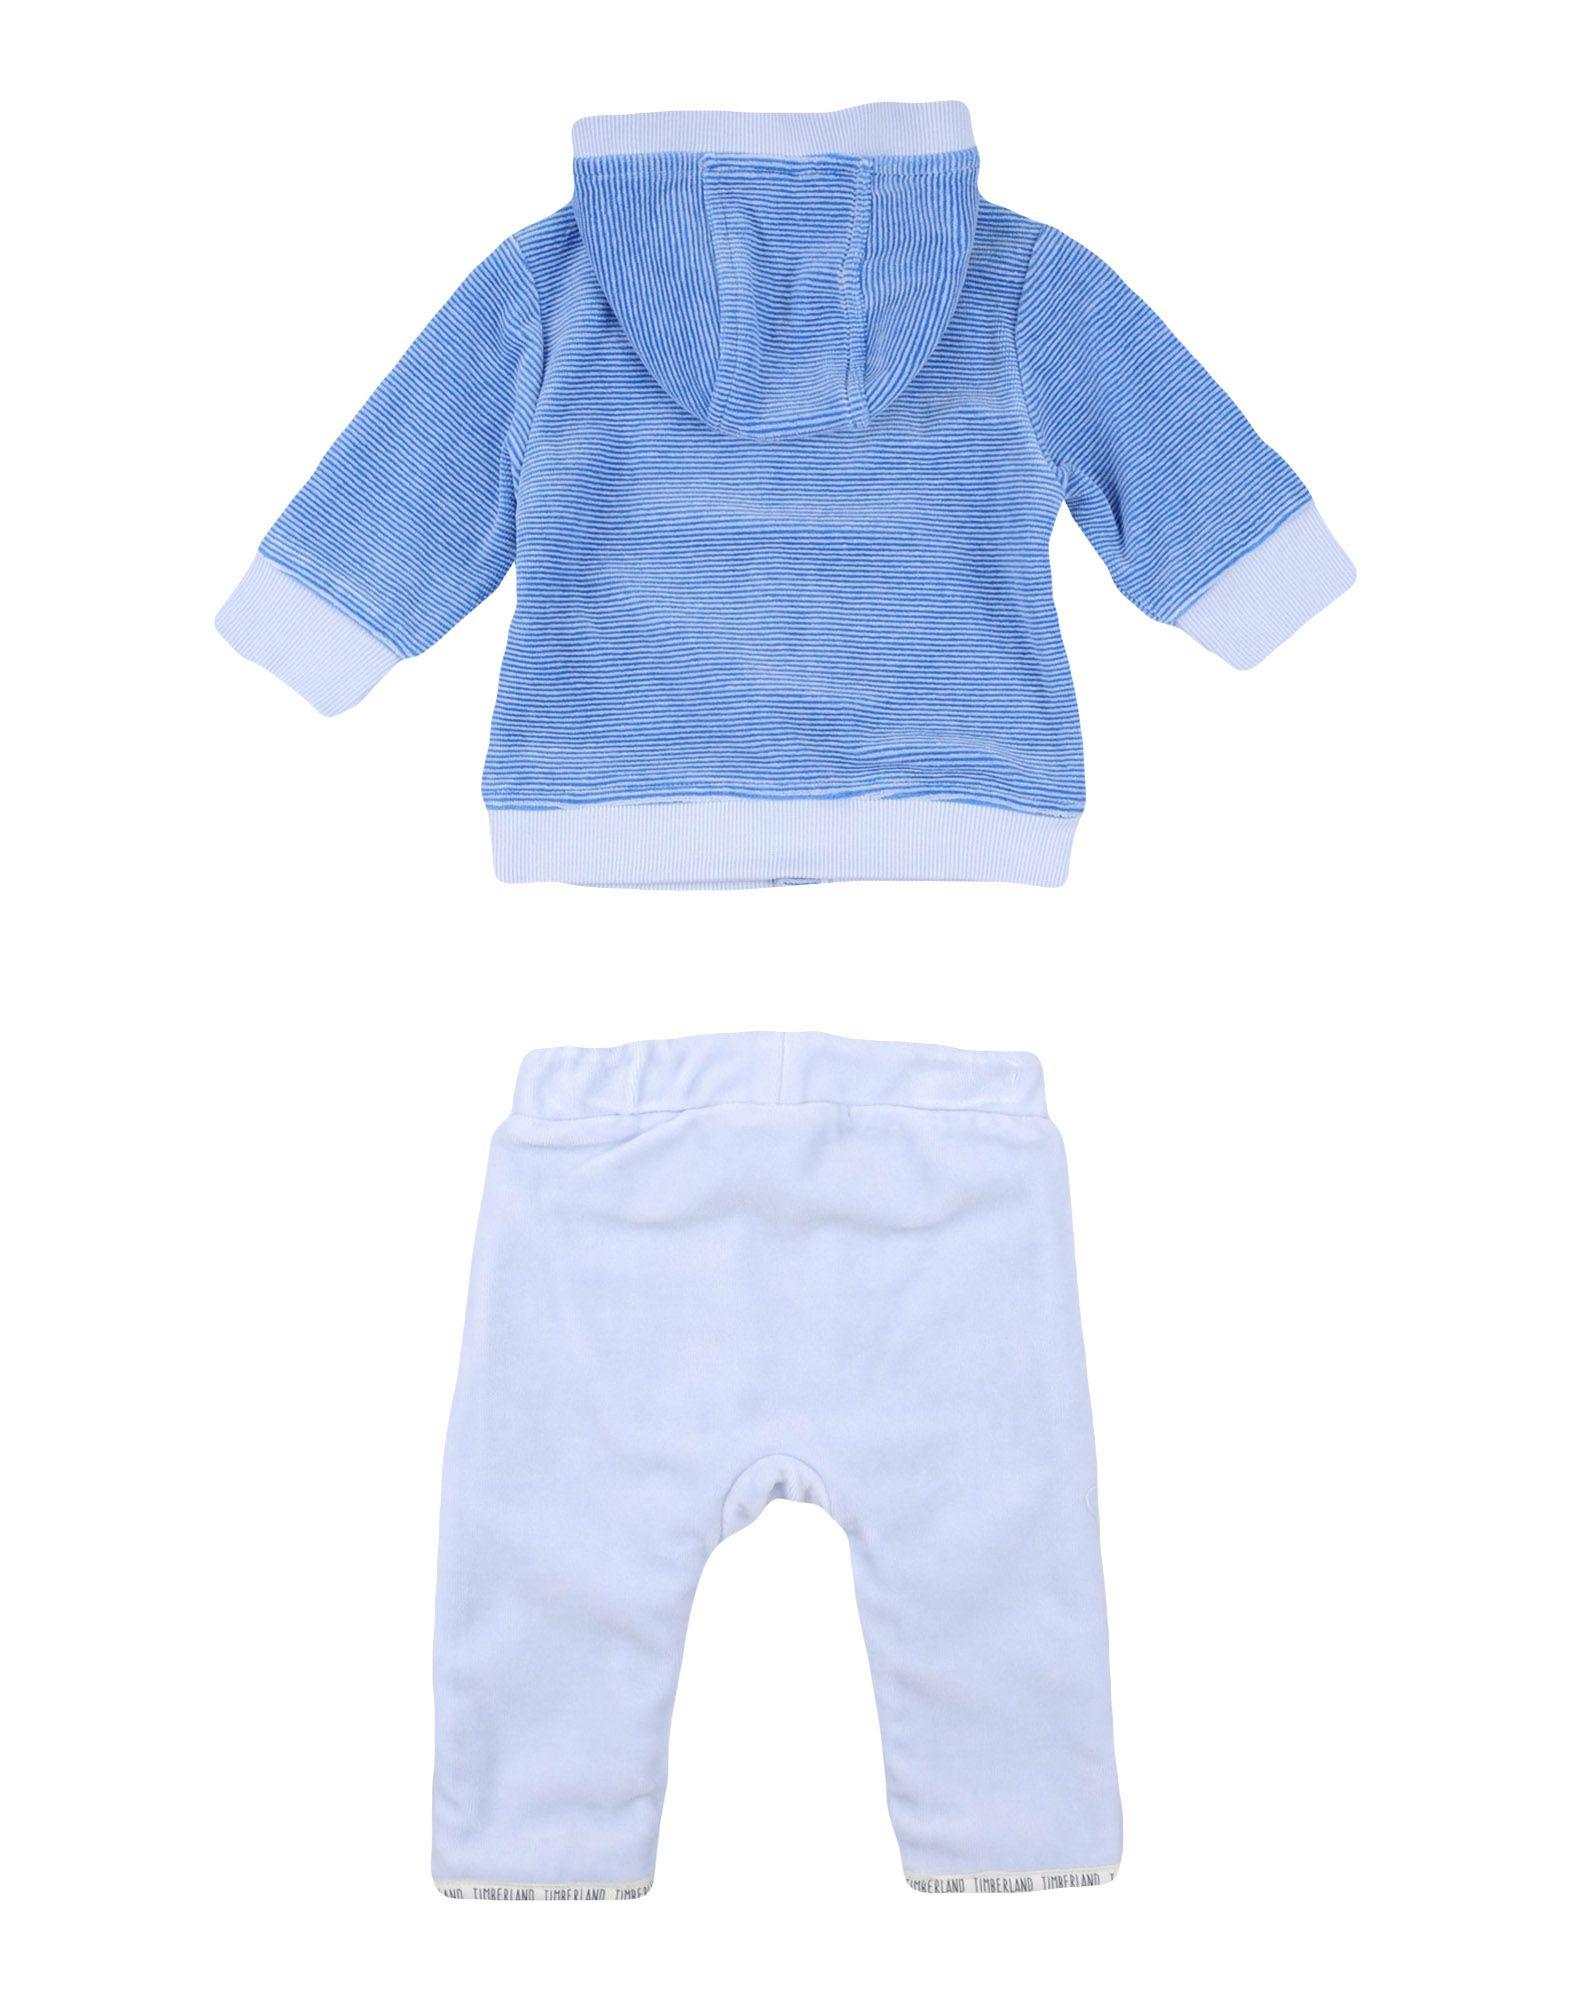 Timberland - Bodysuits & Sets - Baby Fleece Sets - On Yoox.com